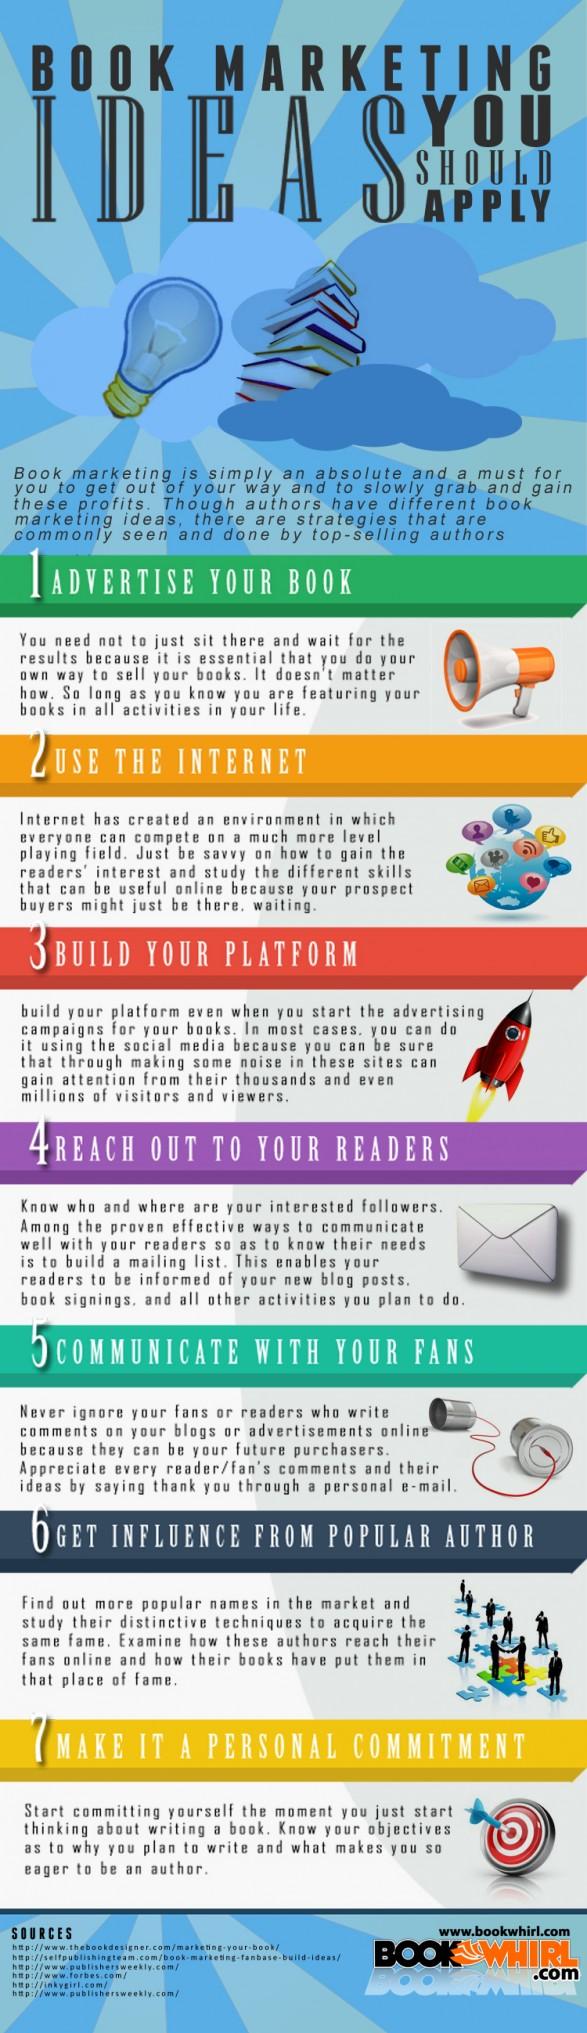 Book Marketing Steps